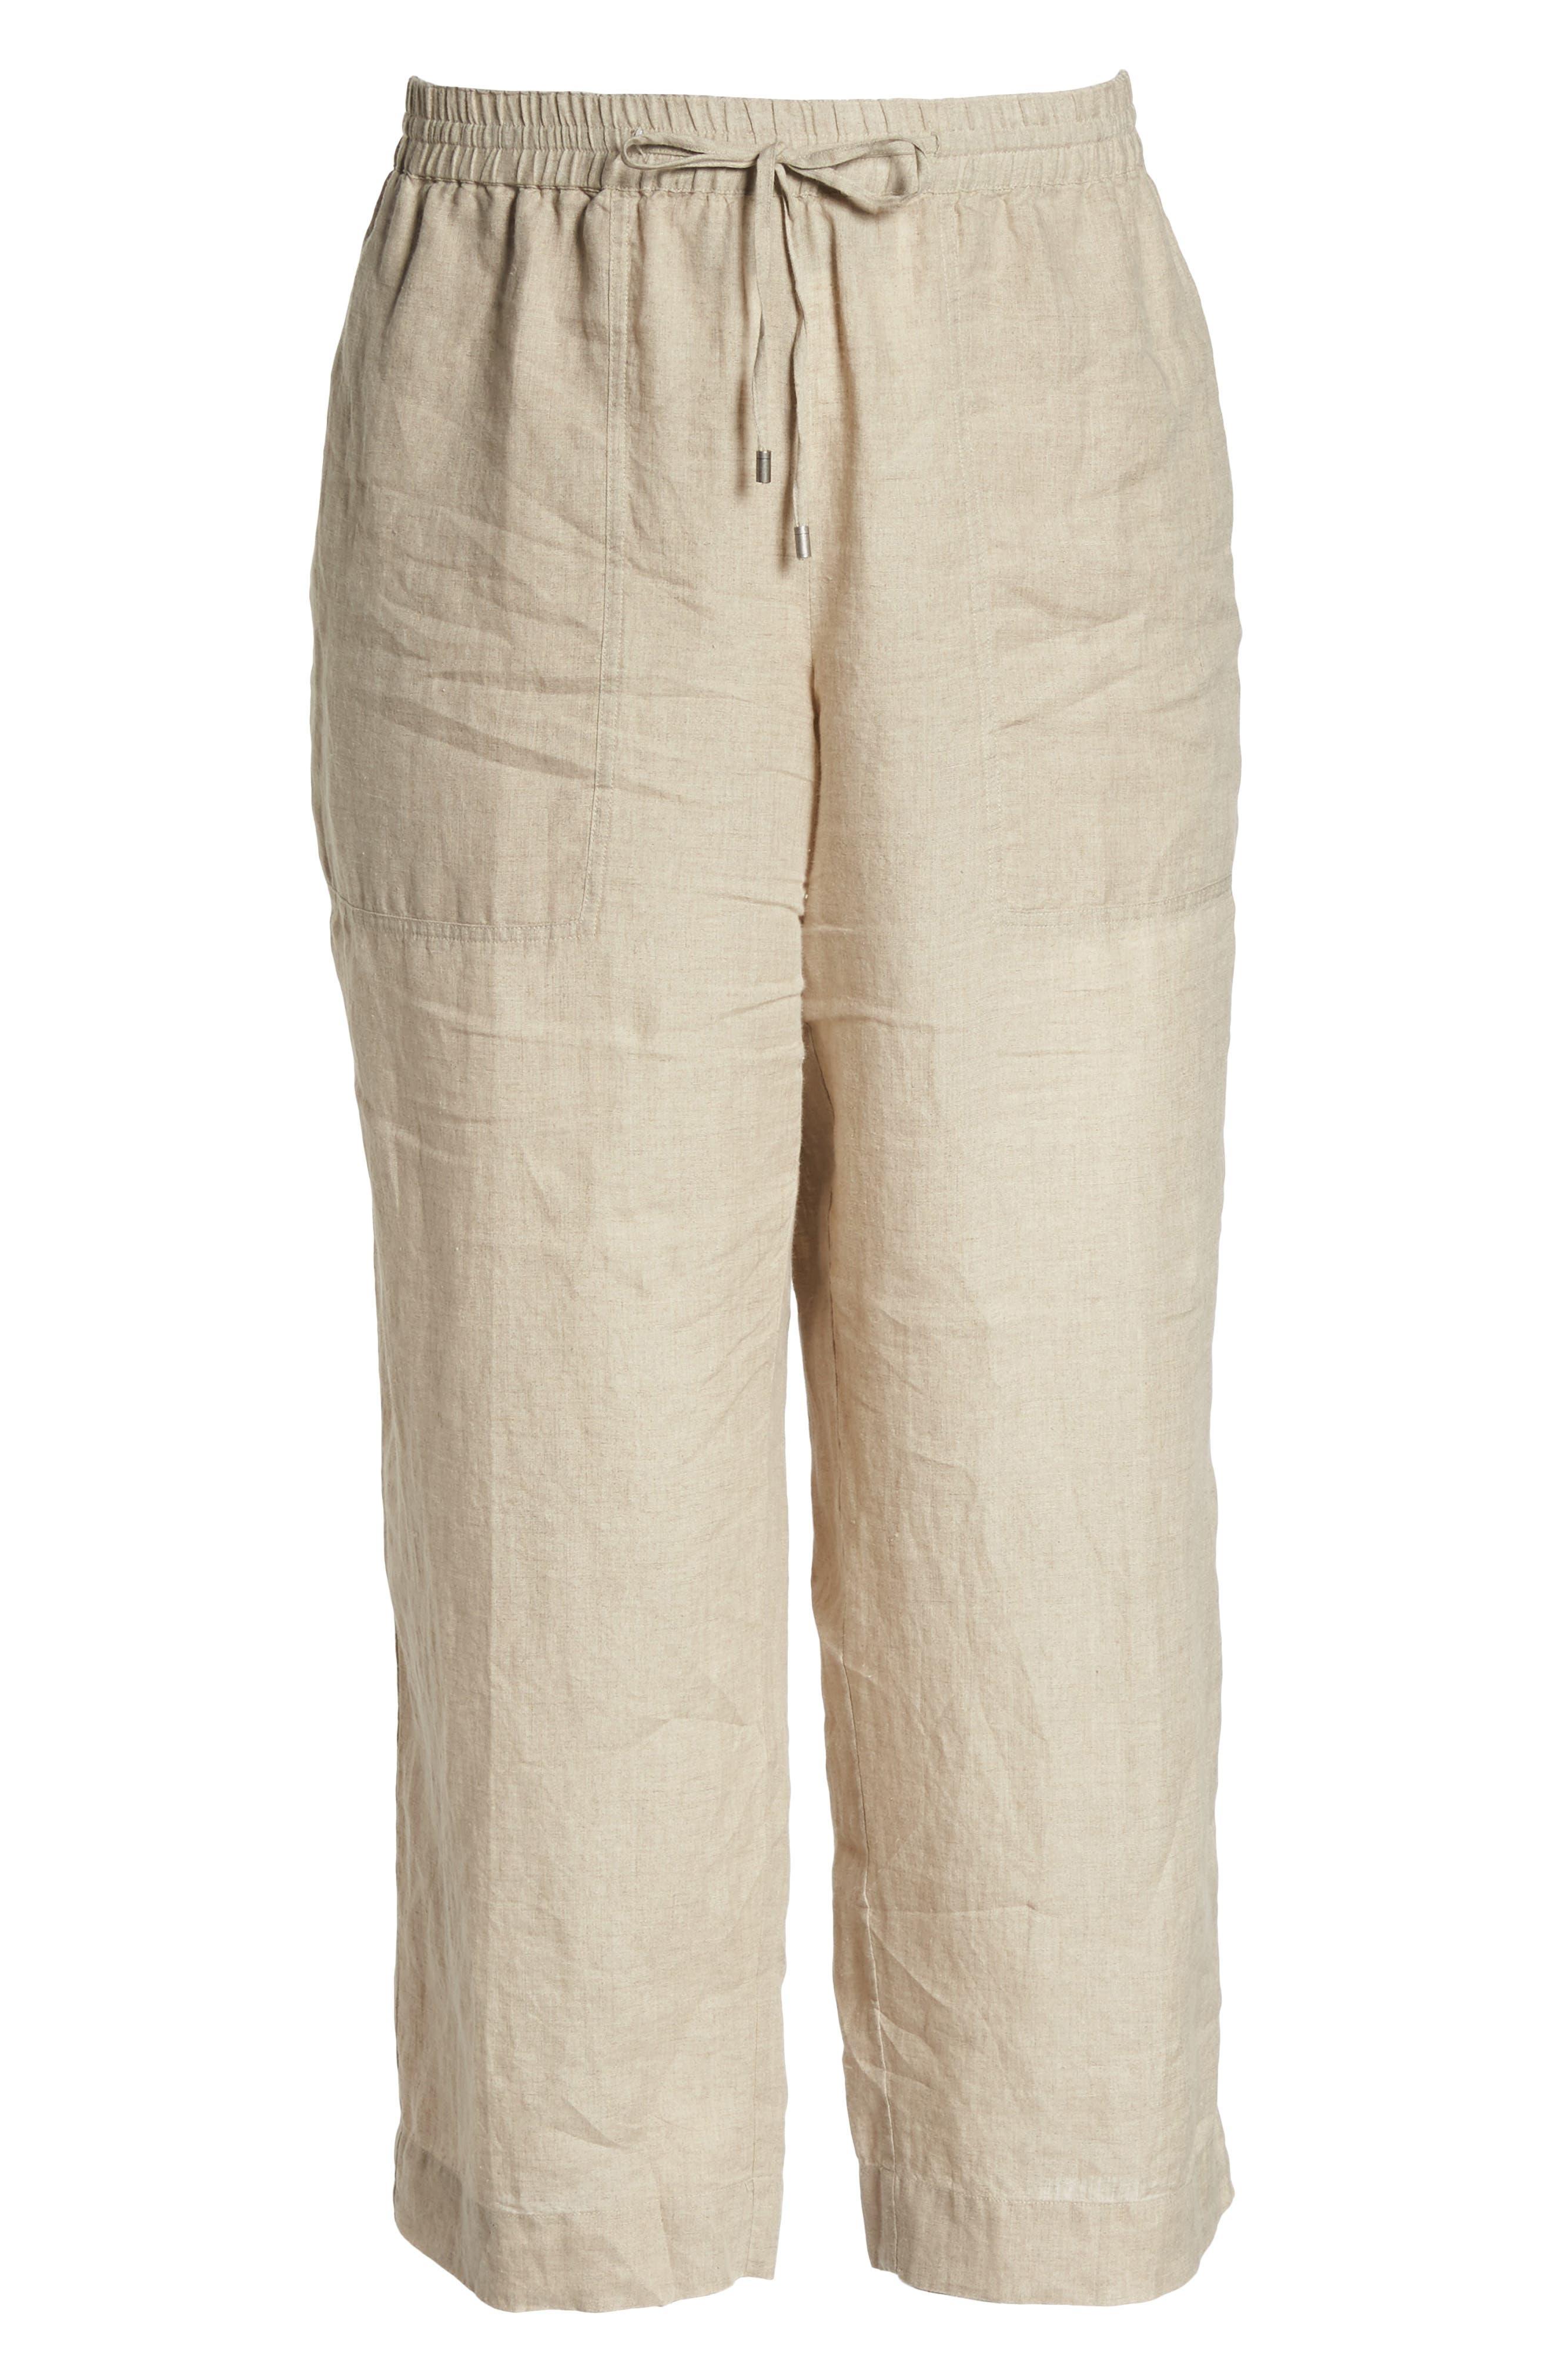 Organic Linen Ankle Pants,                             Alternate thumbnail 7, color,                             Undyed Natural